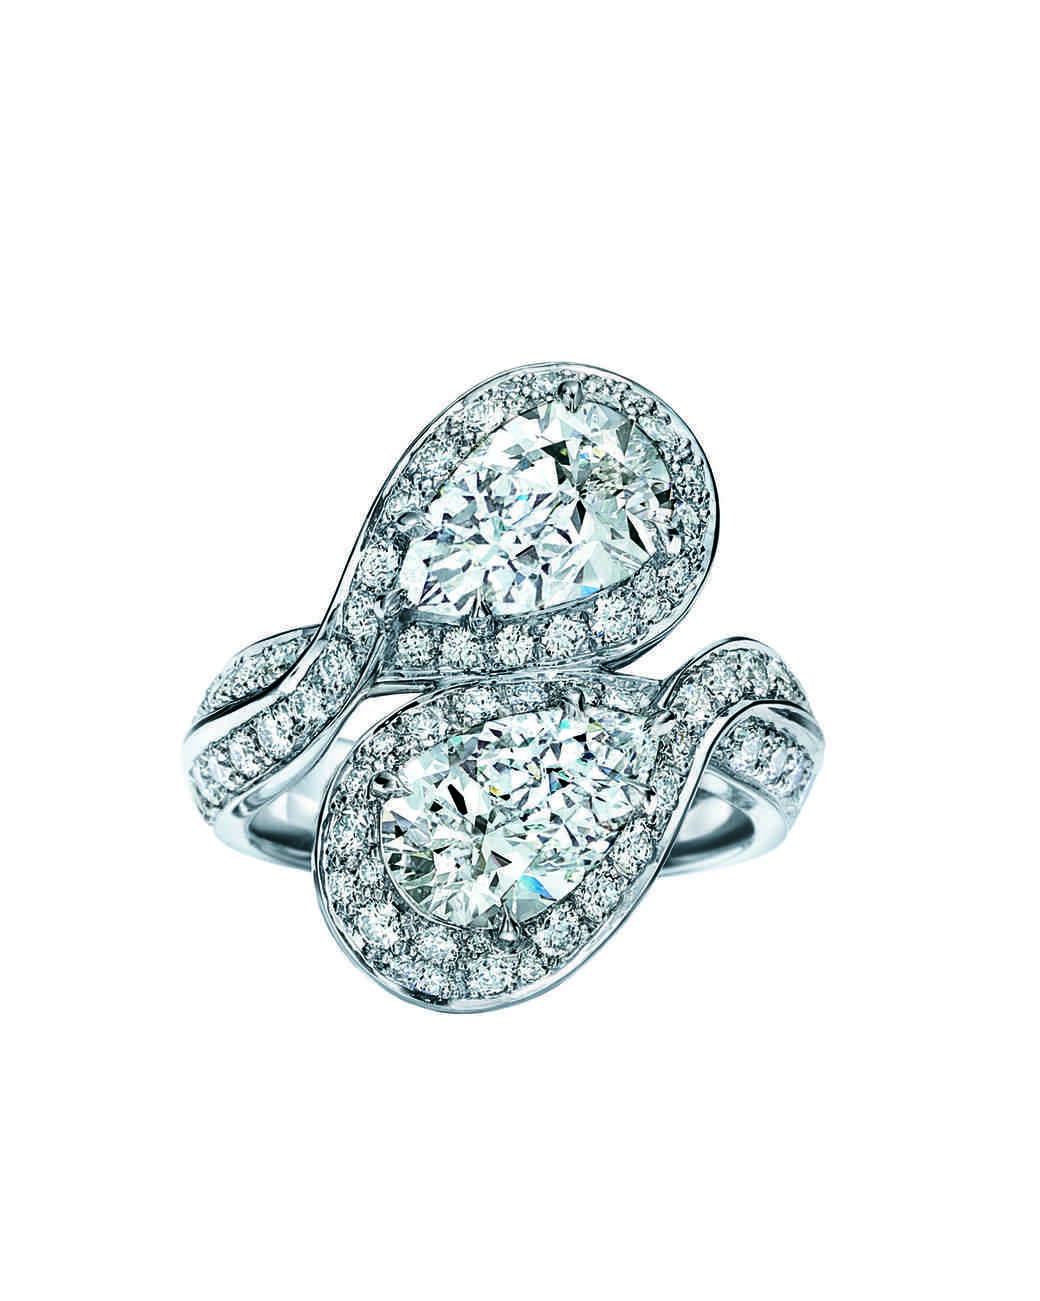 Tiffany & Co. Engagement Ring